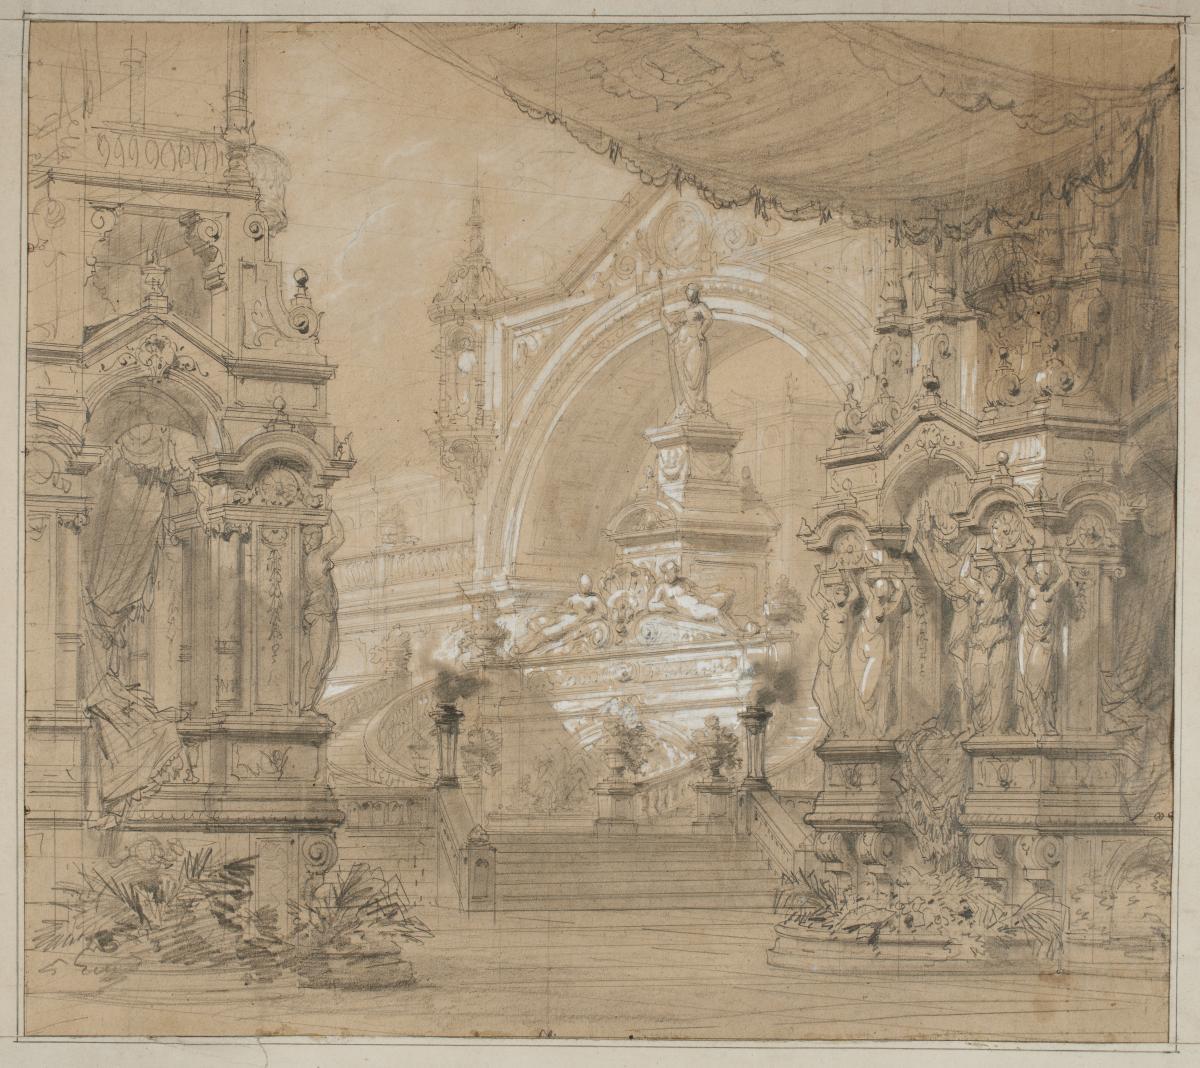 Philippe Chaperon (1823-1906), Theater Decor Project